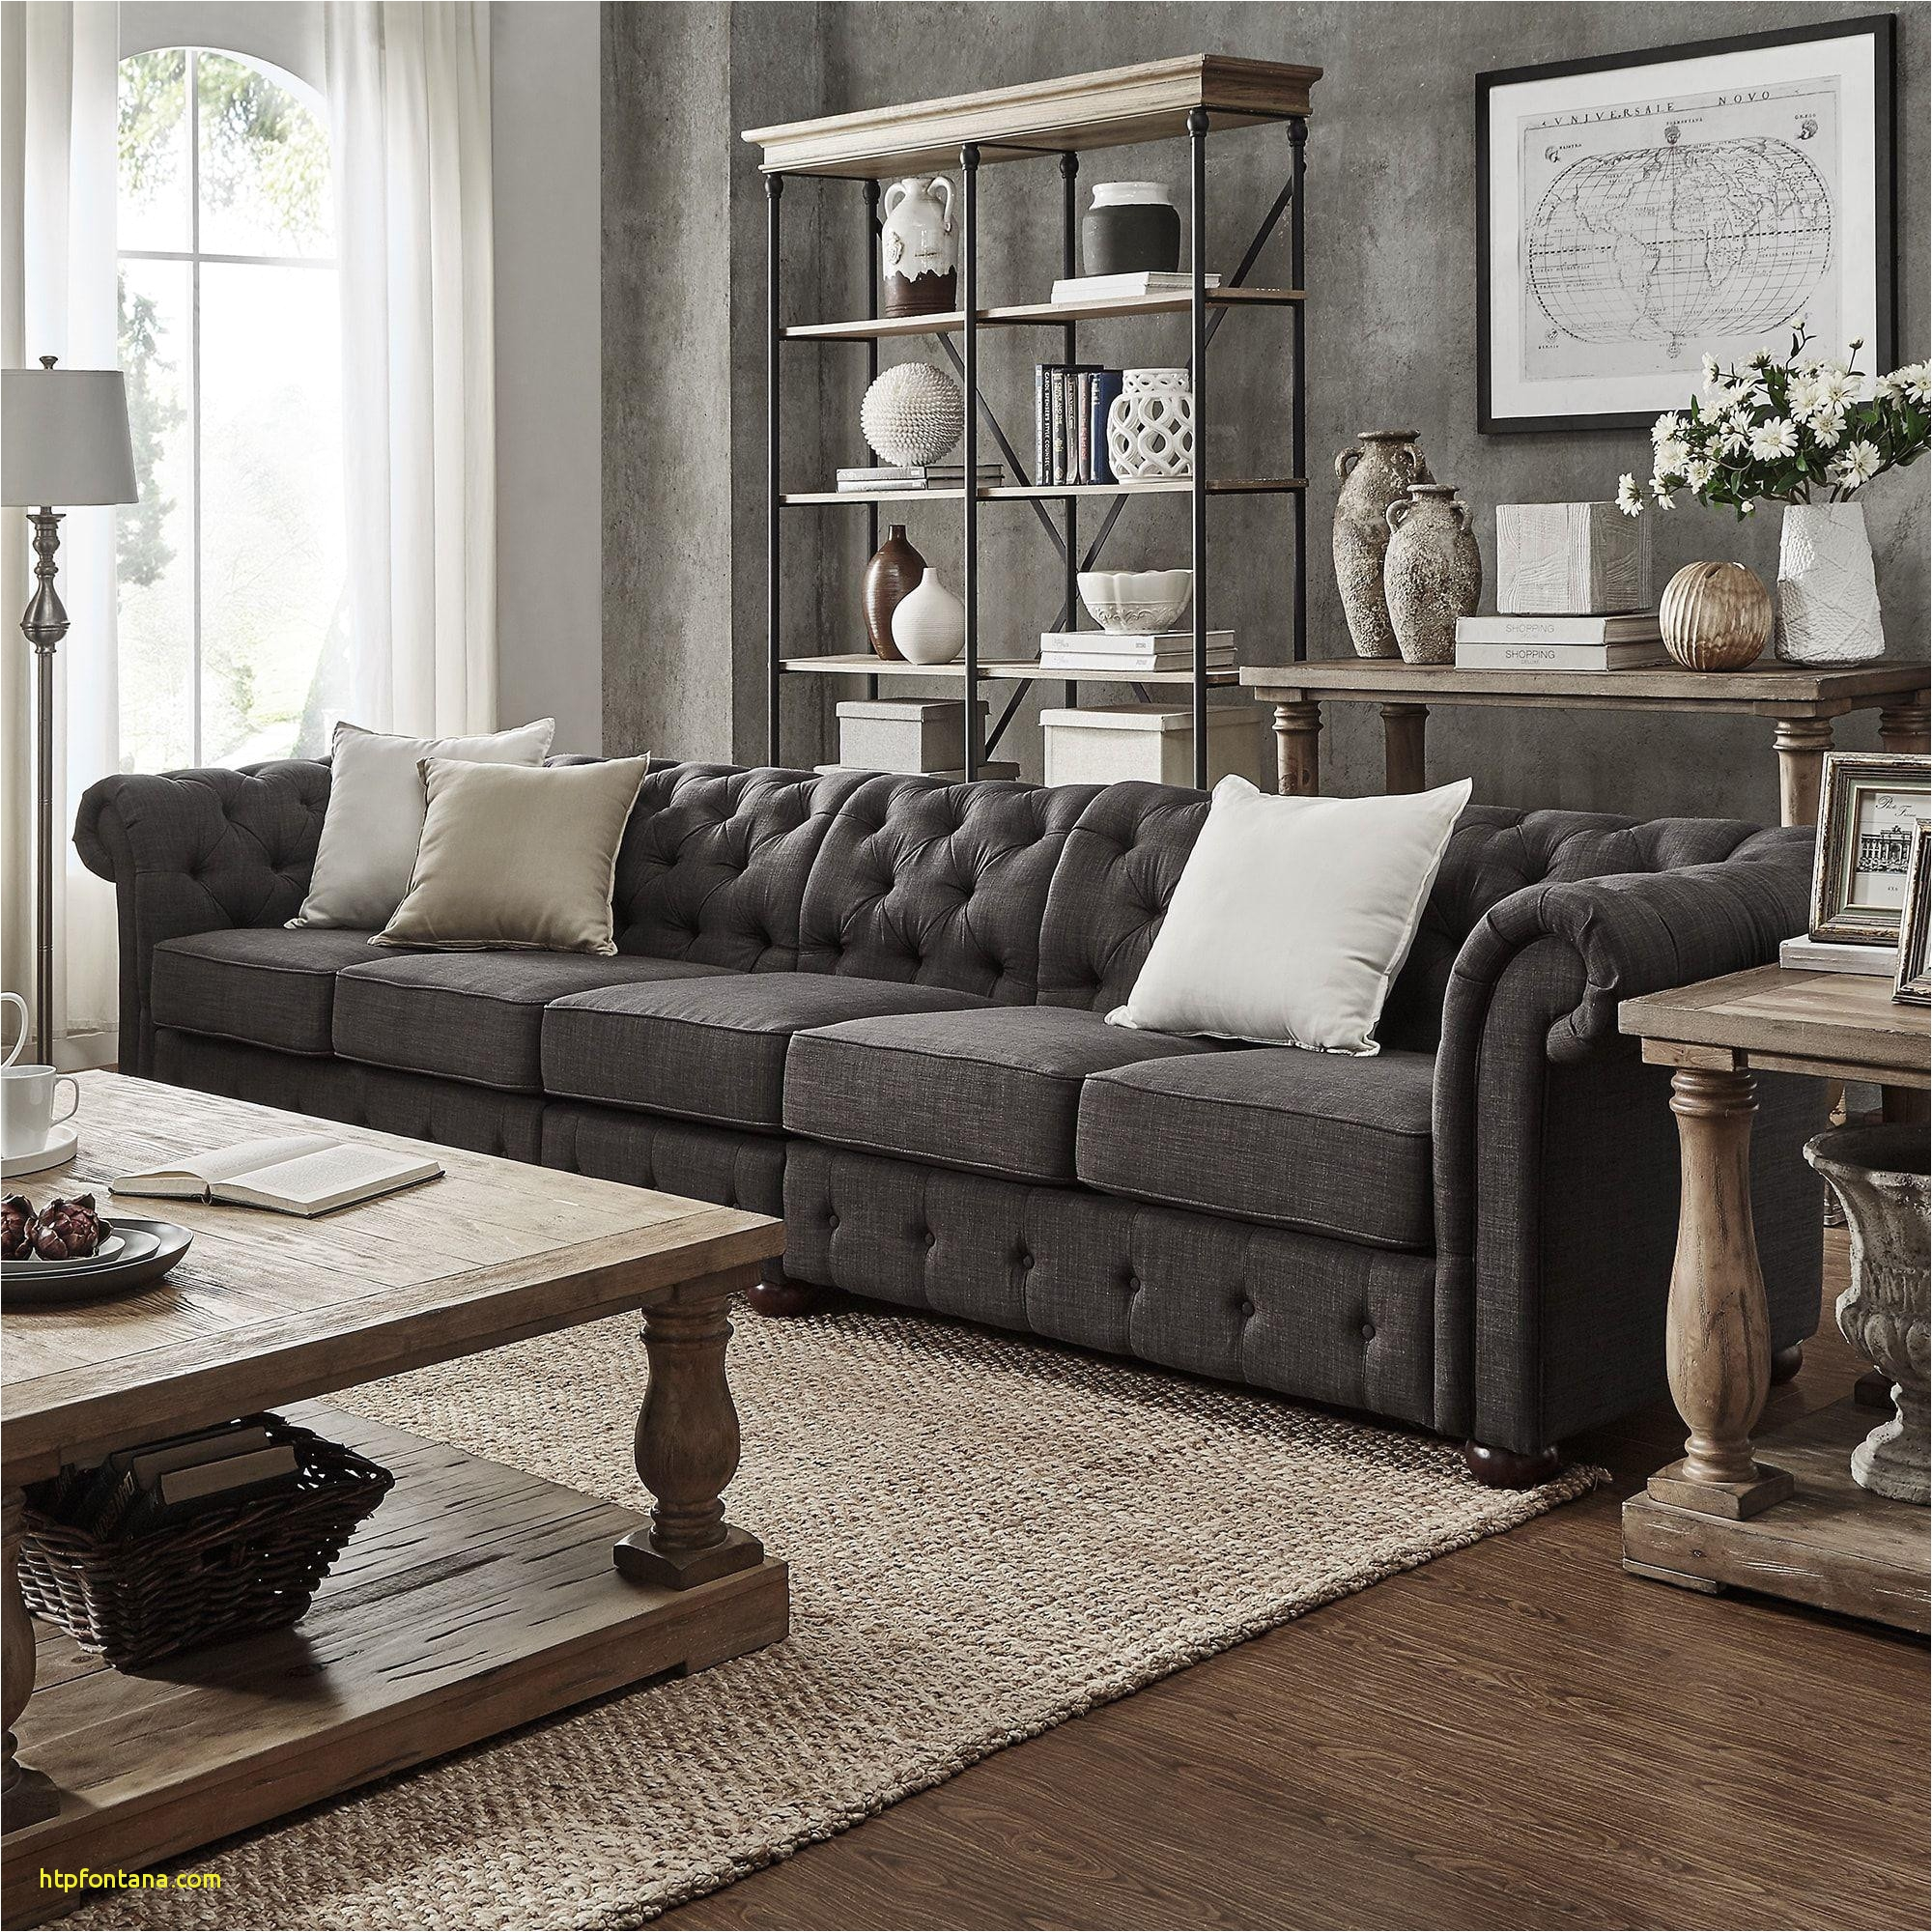 living room design gray couch fresh black sofas living room design fresh overstock couches 0d tags